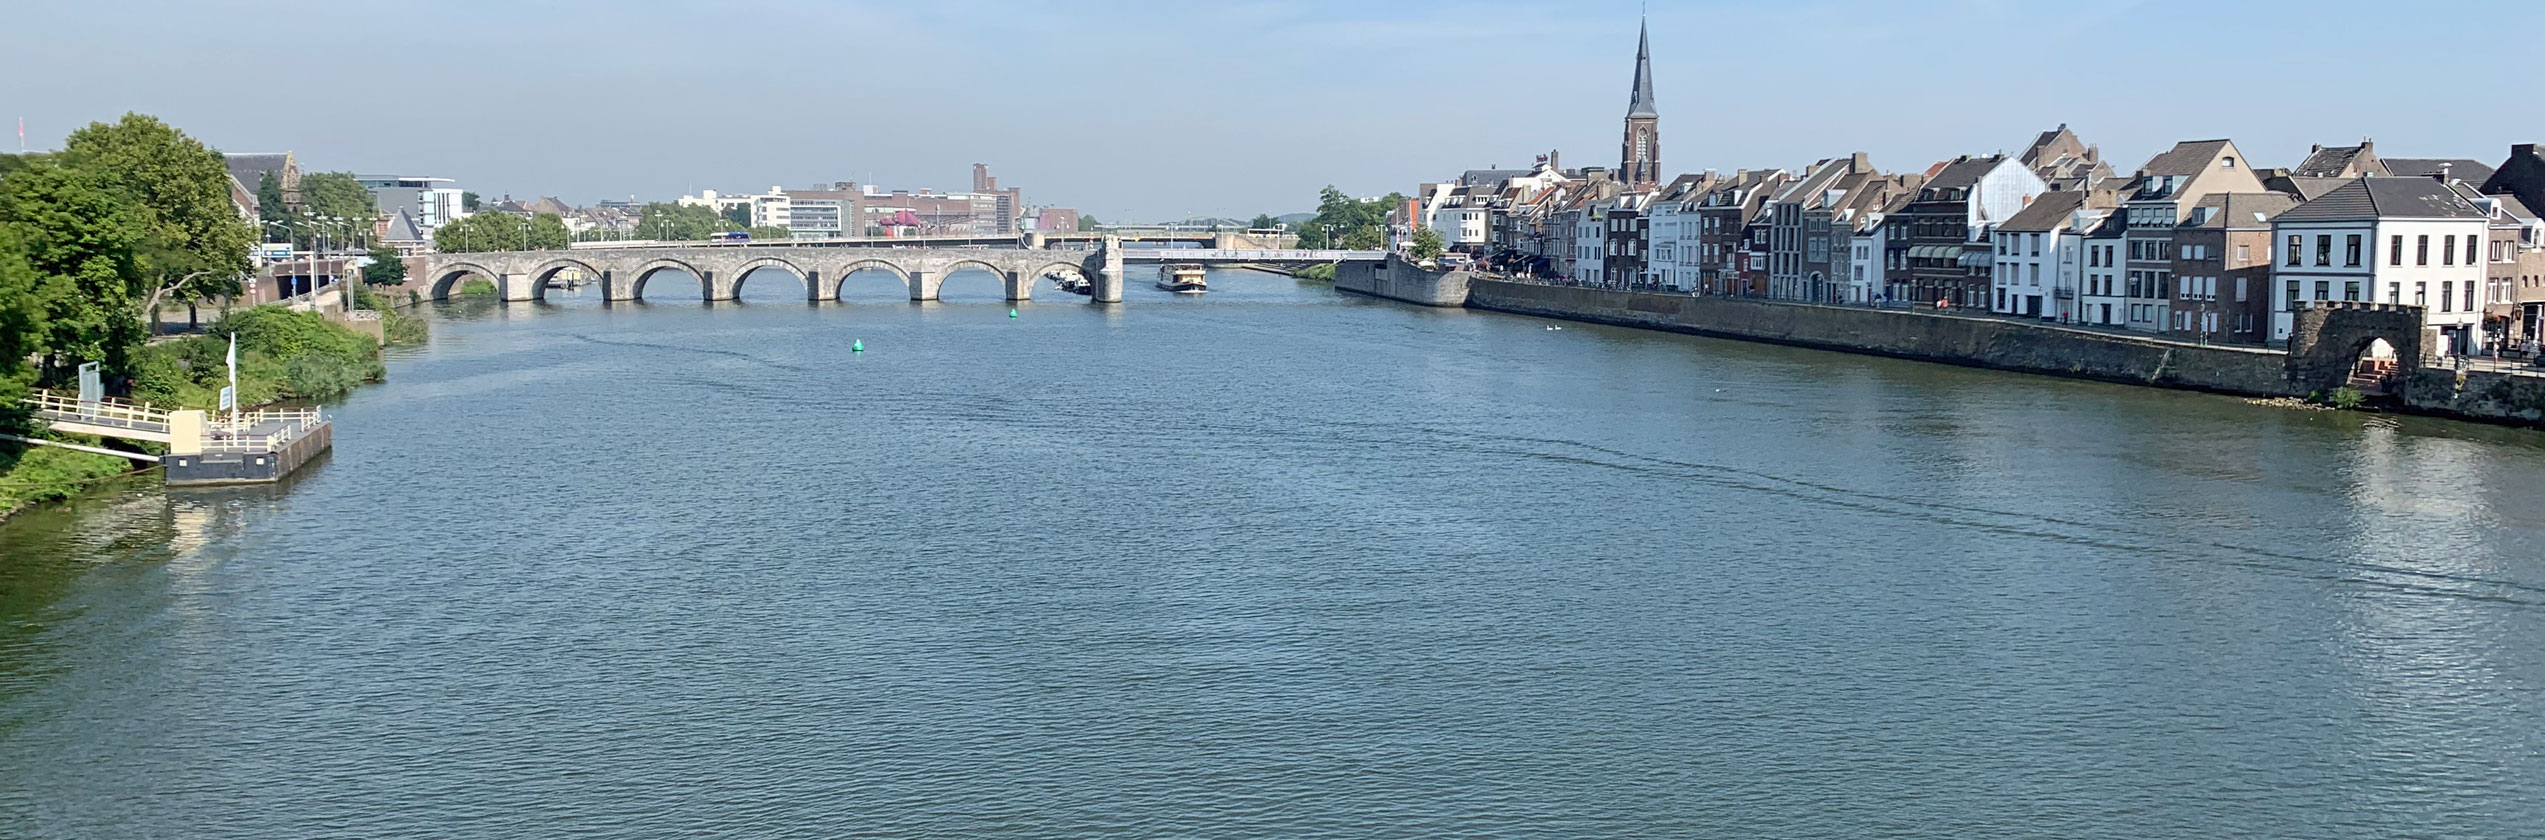 Maas-bij-Maastricht